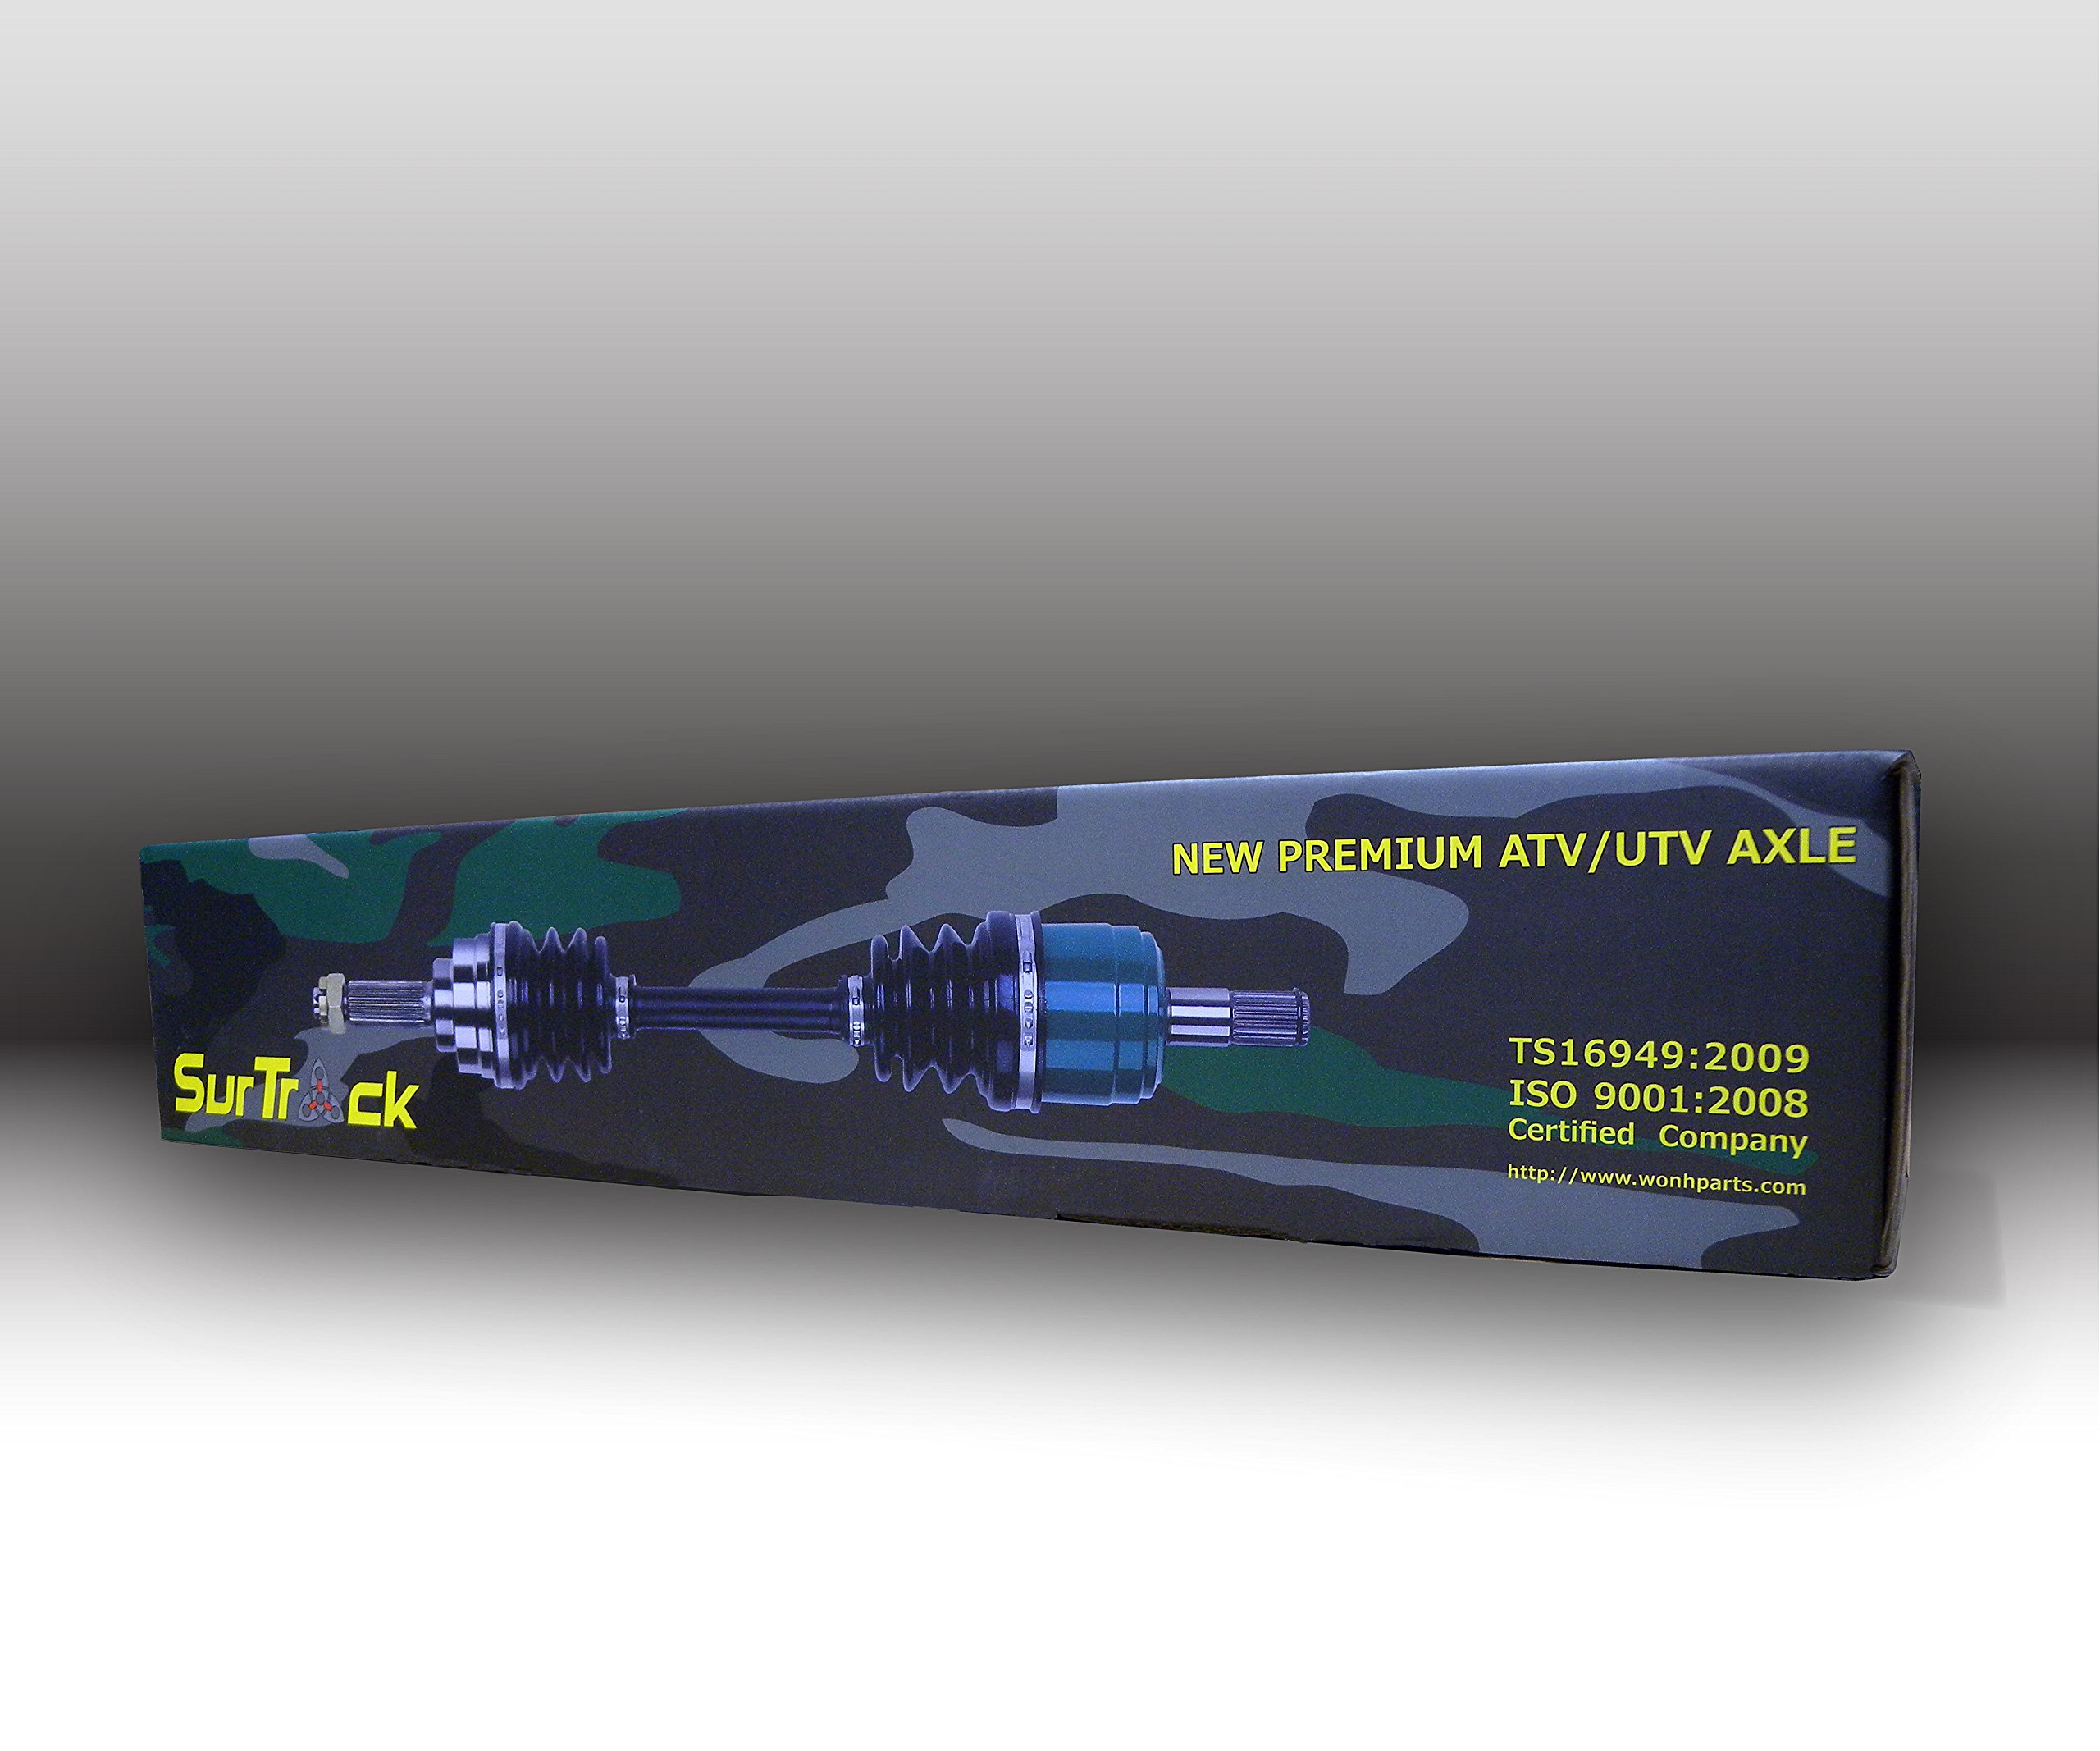 2010 Kawasaki KRF750 Teryx FI 4x4 Sport ATV UTV Rear Right Complete CV Axle Assembly Rear Passenger Side by Approved Performance (Image #1)